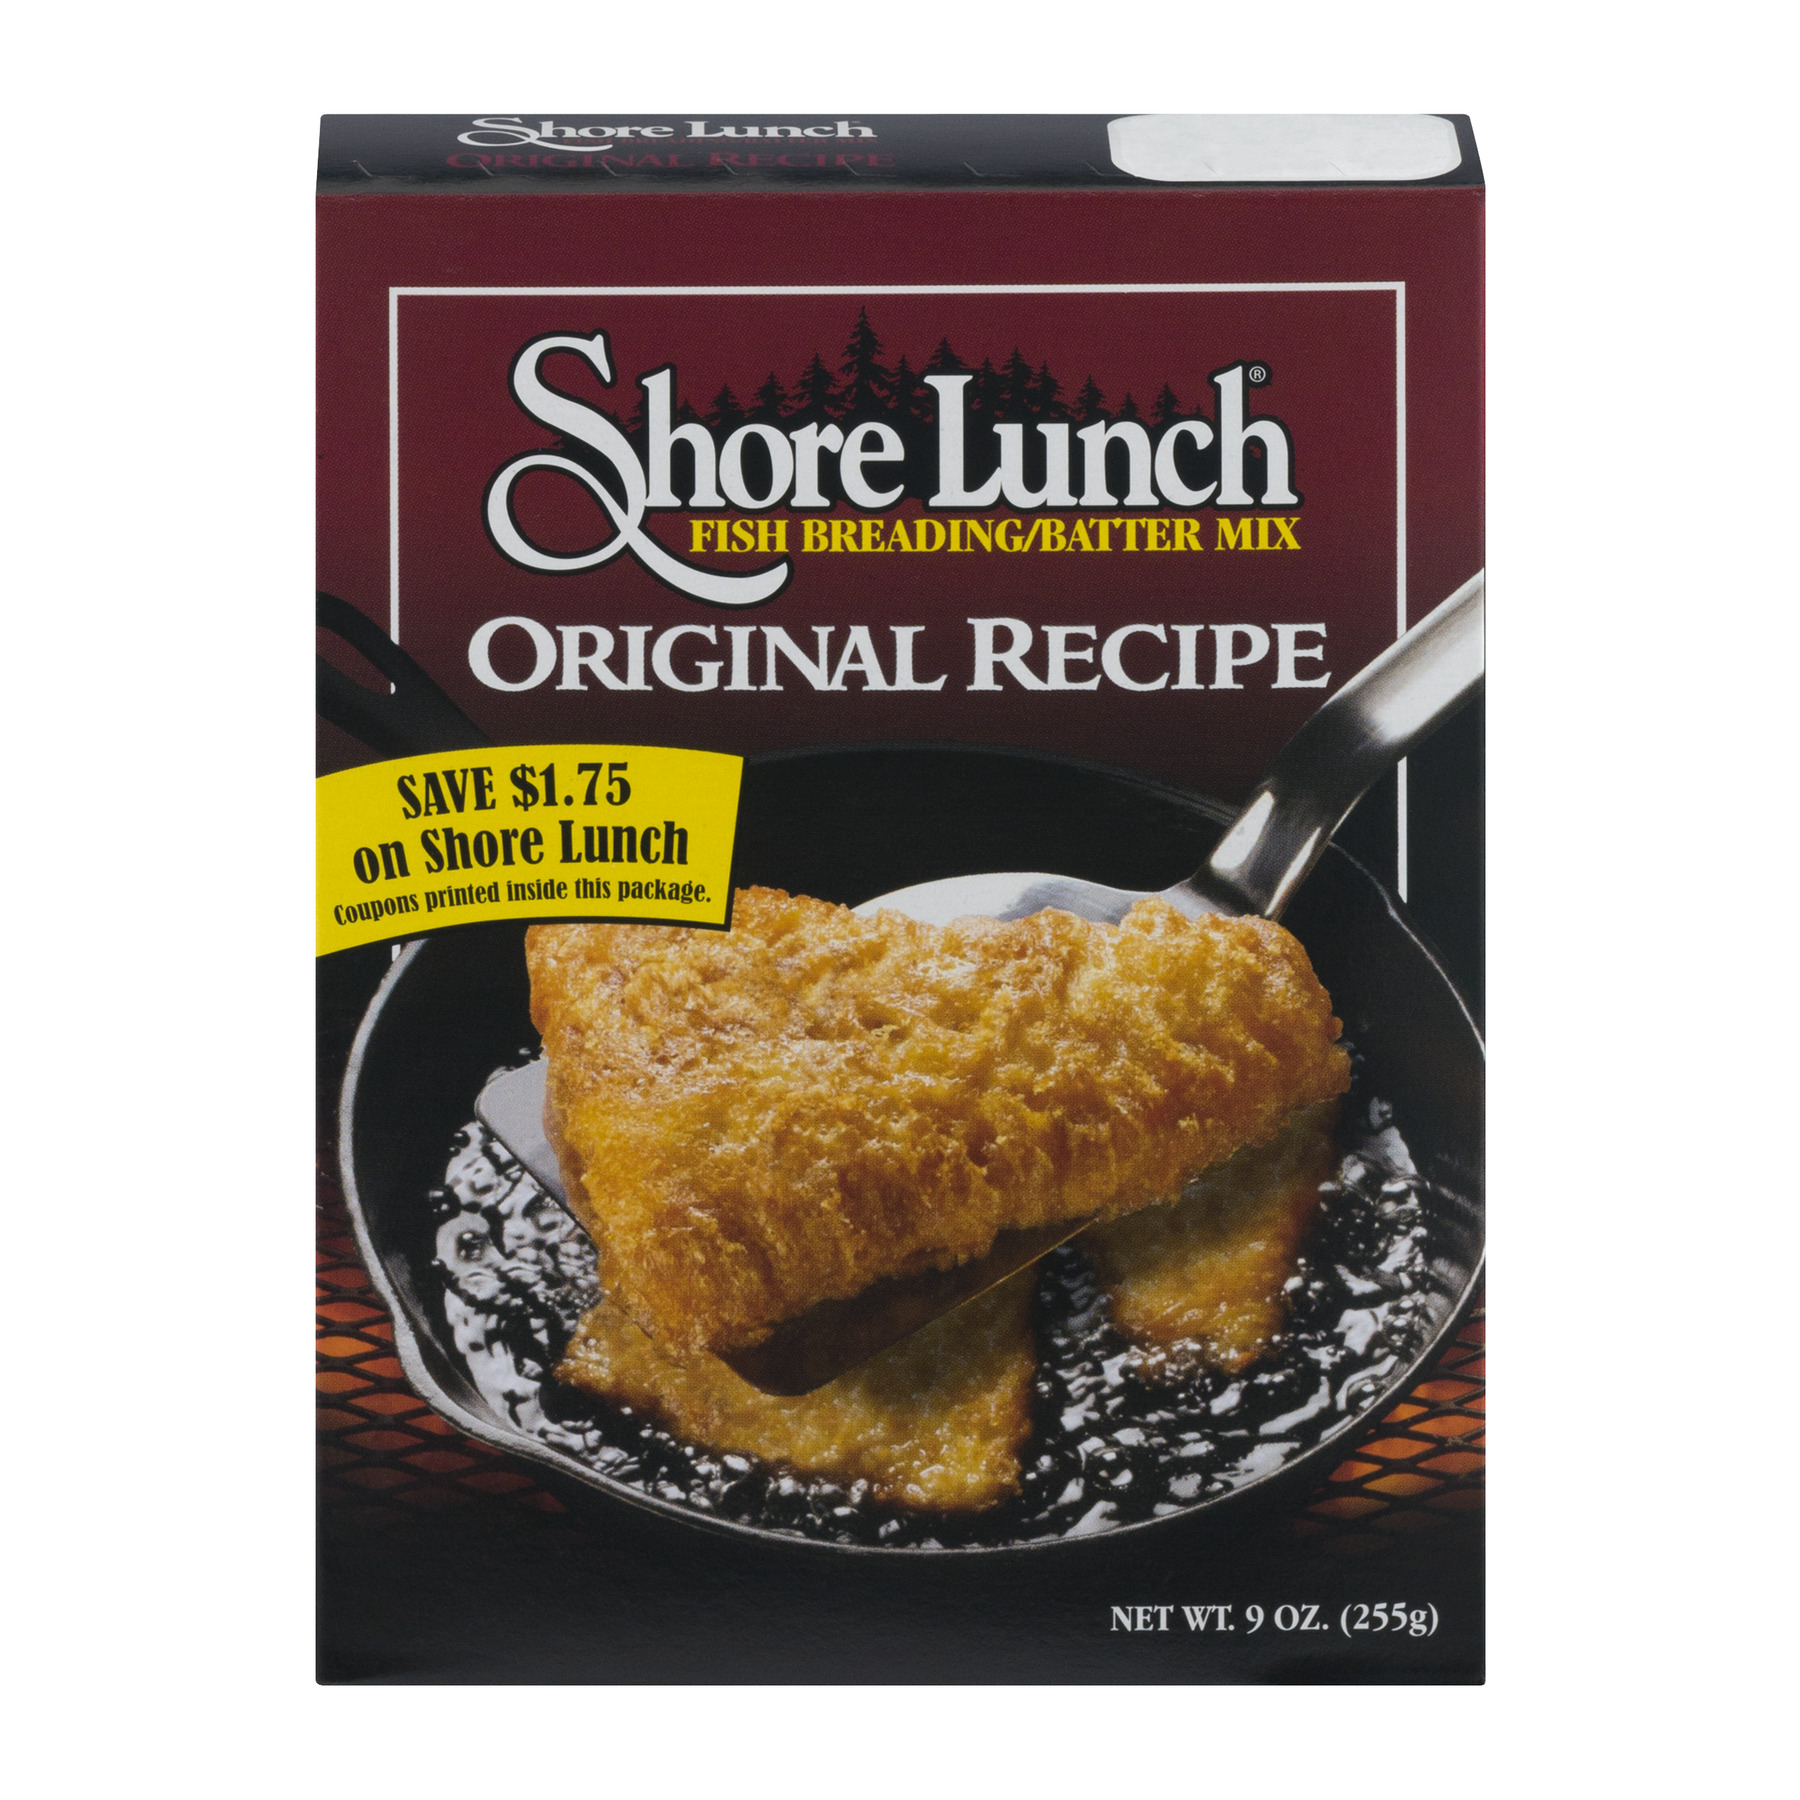 Shore Lunch Fish Breading/Batter Mix Original Recipe, 9.0 OZ